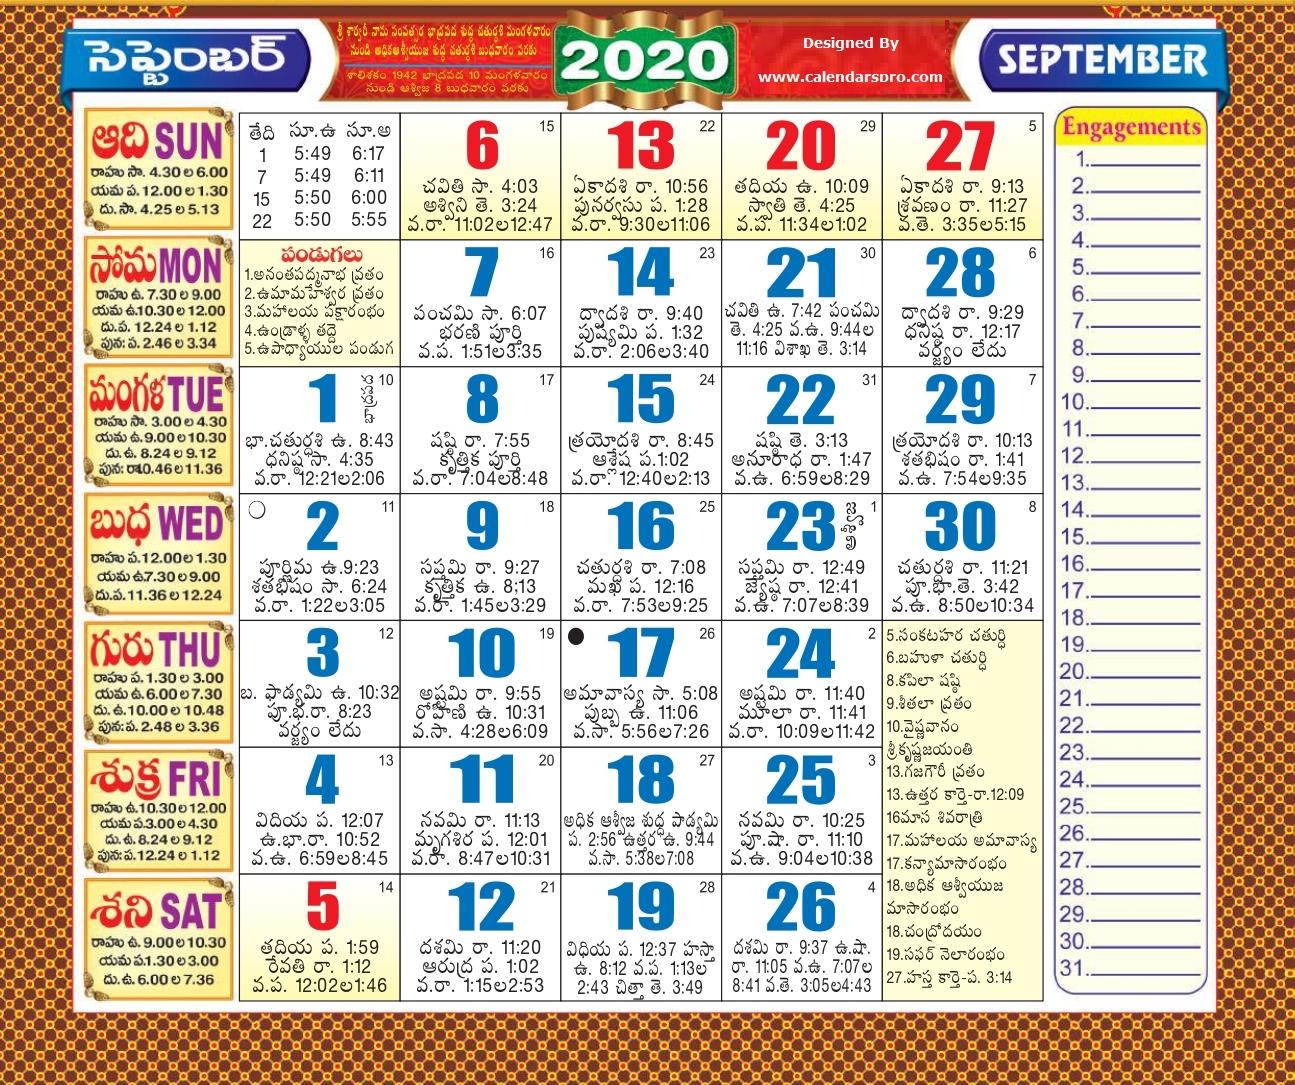 Telugu Calendar 2020 In 2020 | Printable Calendar Template